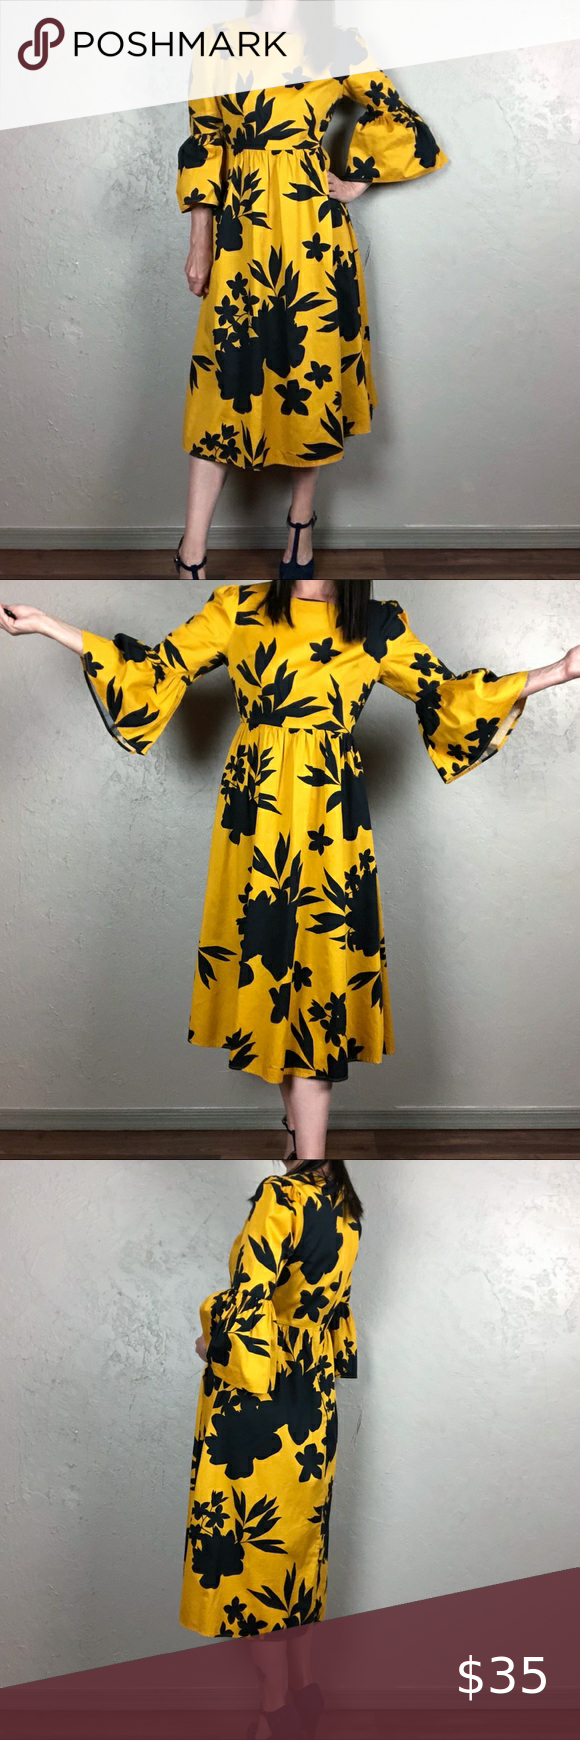 Vintage 1980s Yellow and Black Polka Dot Floral Patterned Floor Length Dress